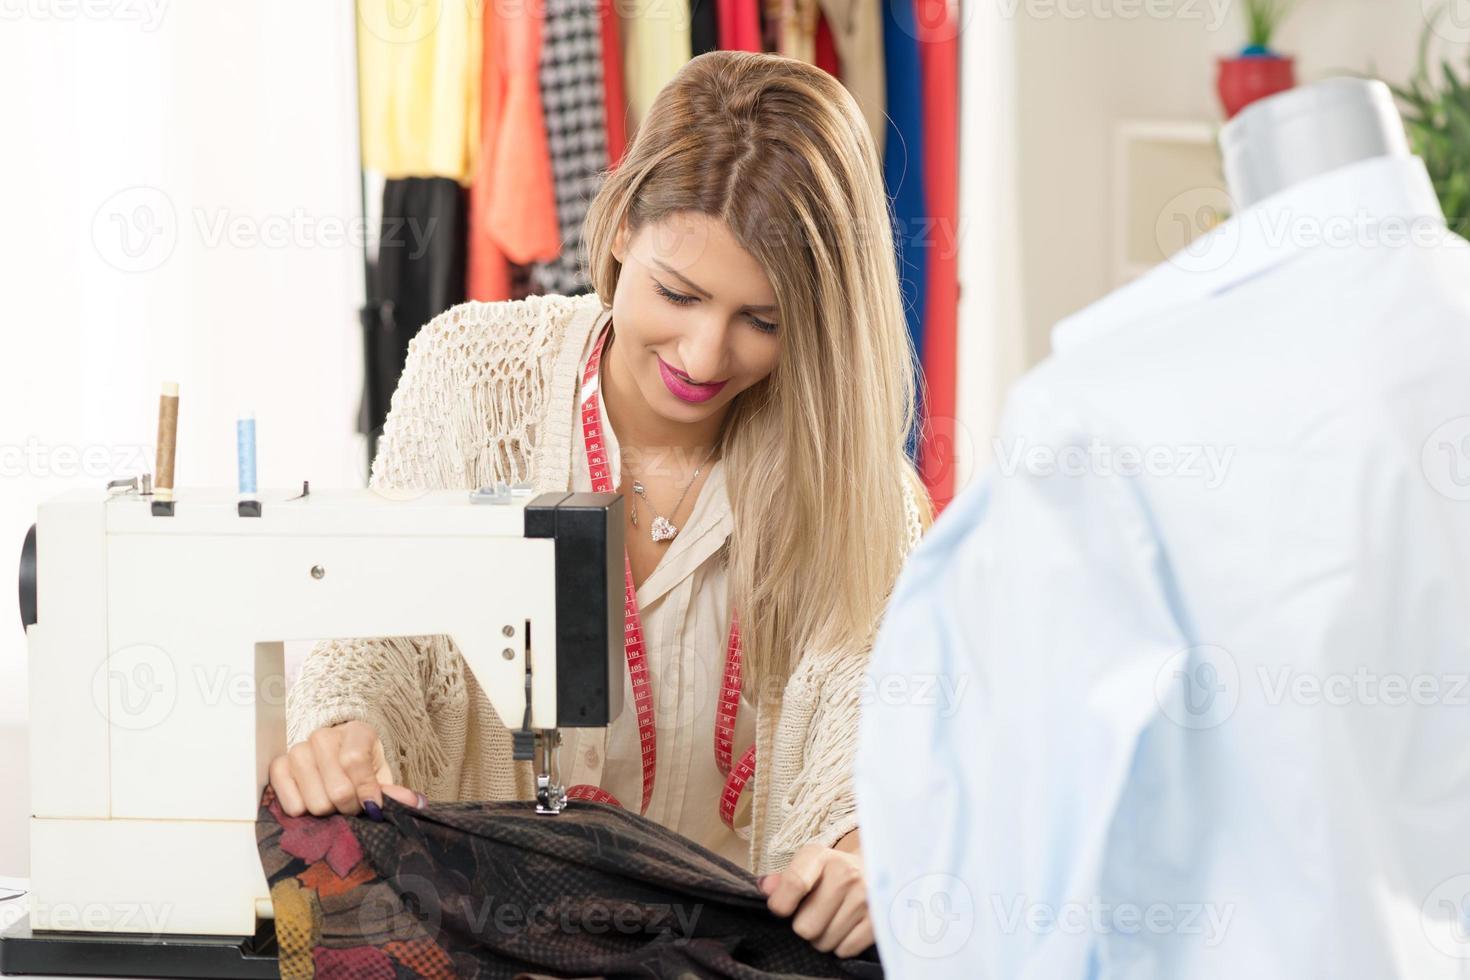 jonge modeontwerper naaien foto